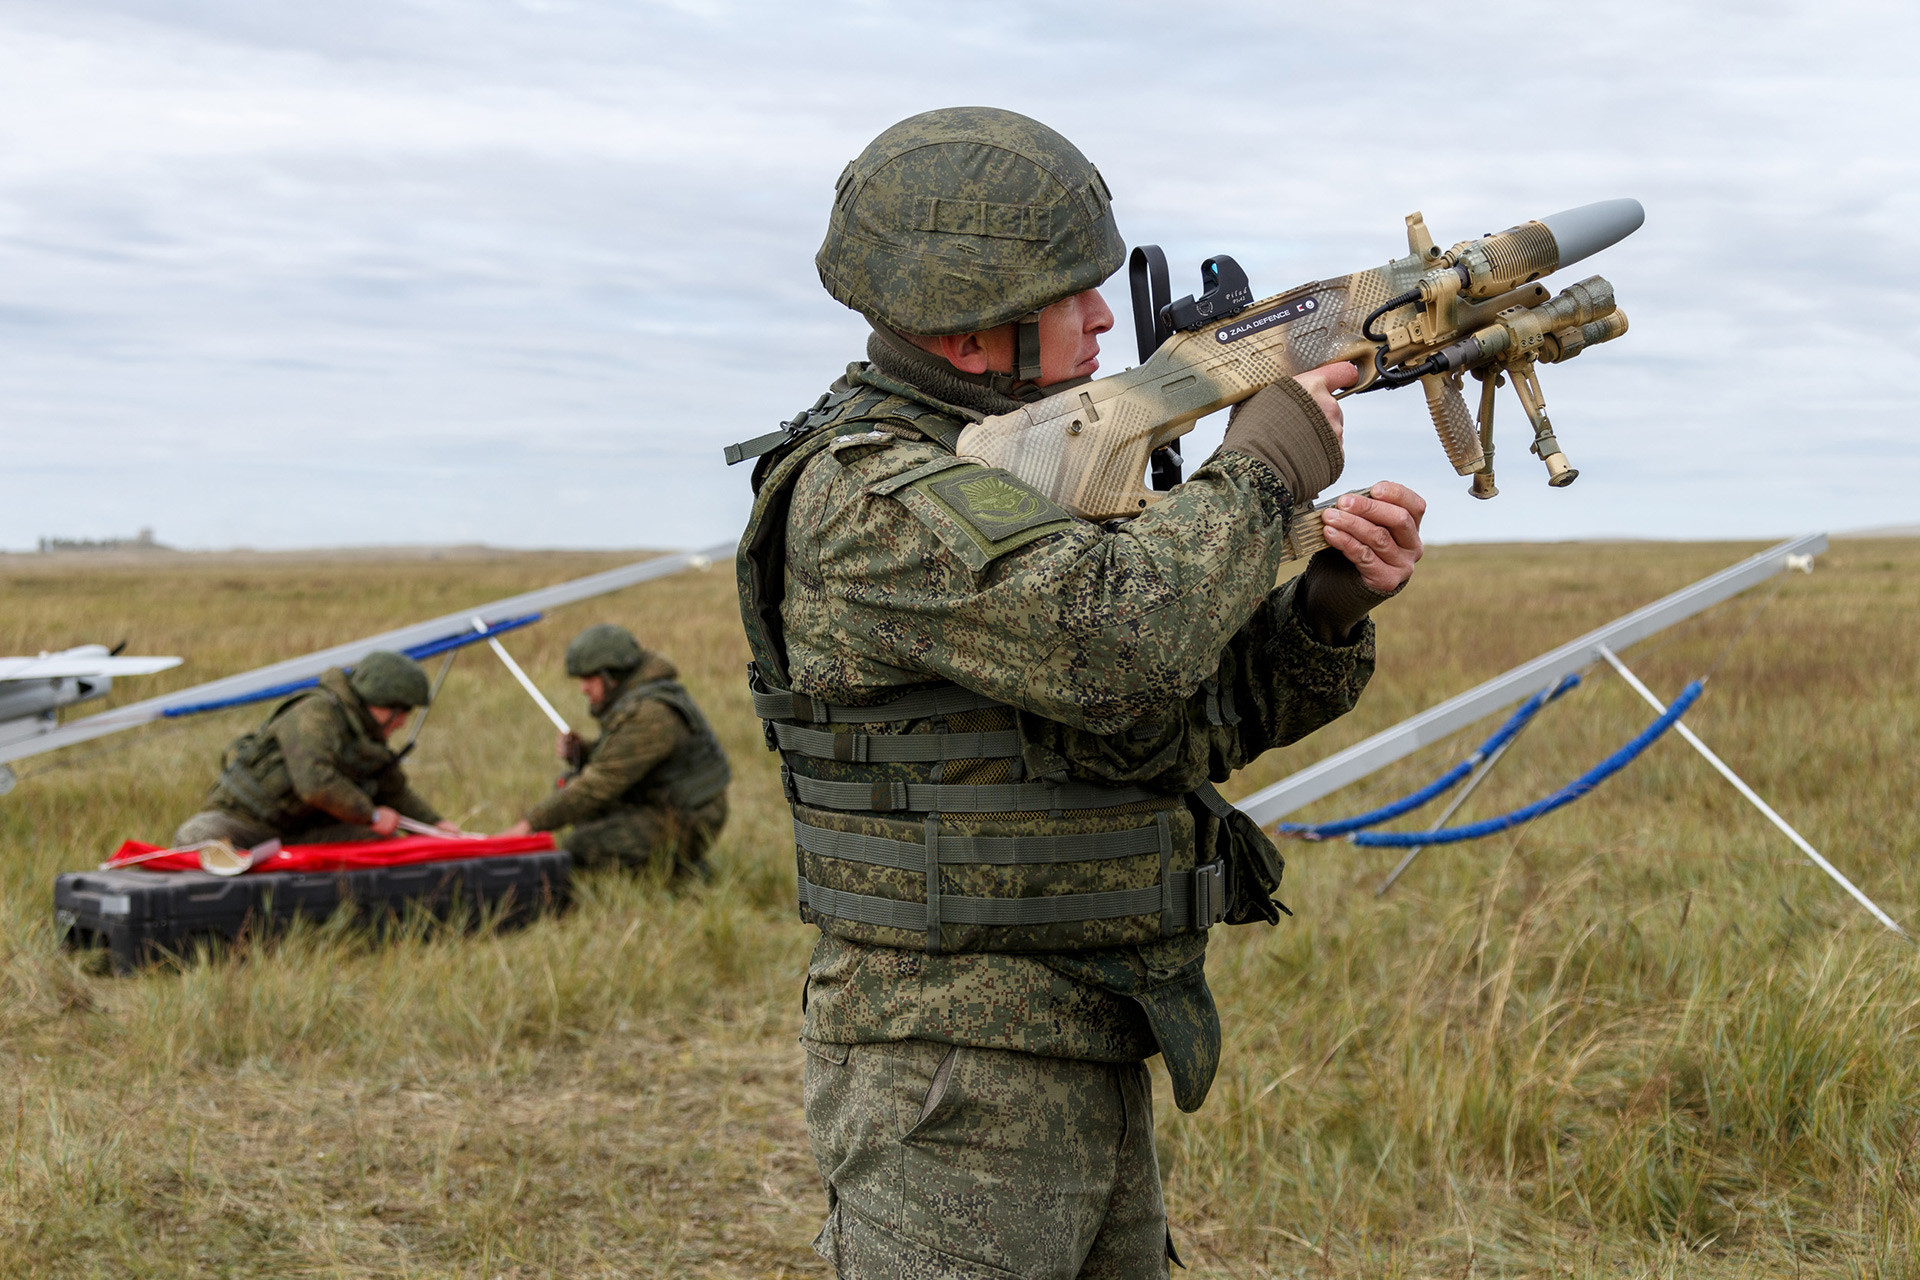 Militar com armamento de defesa contra drones REX 1.